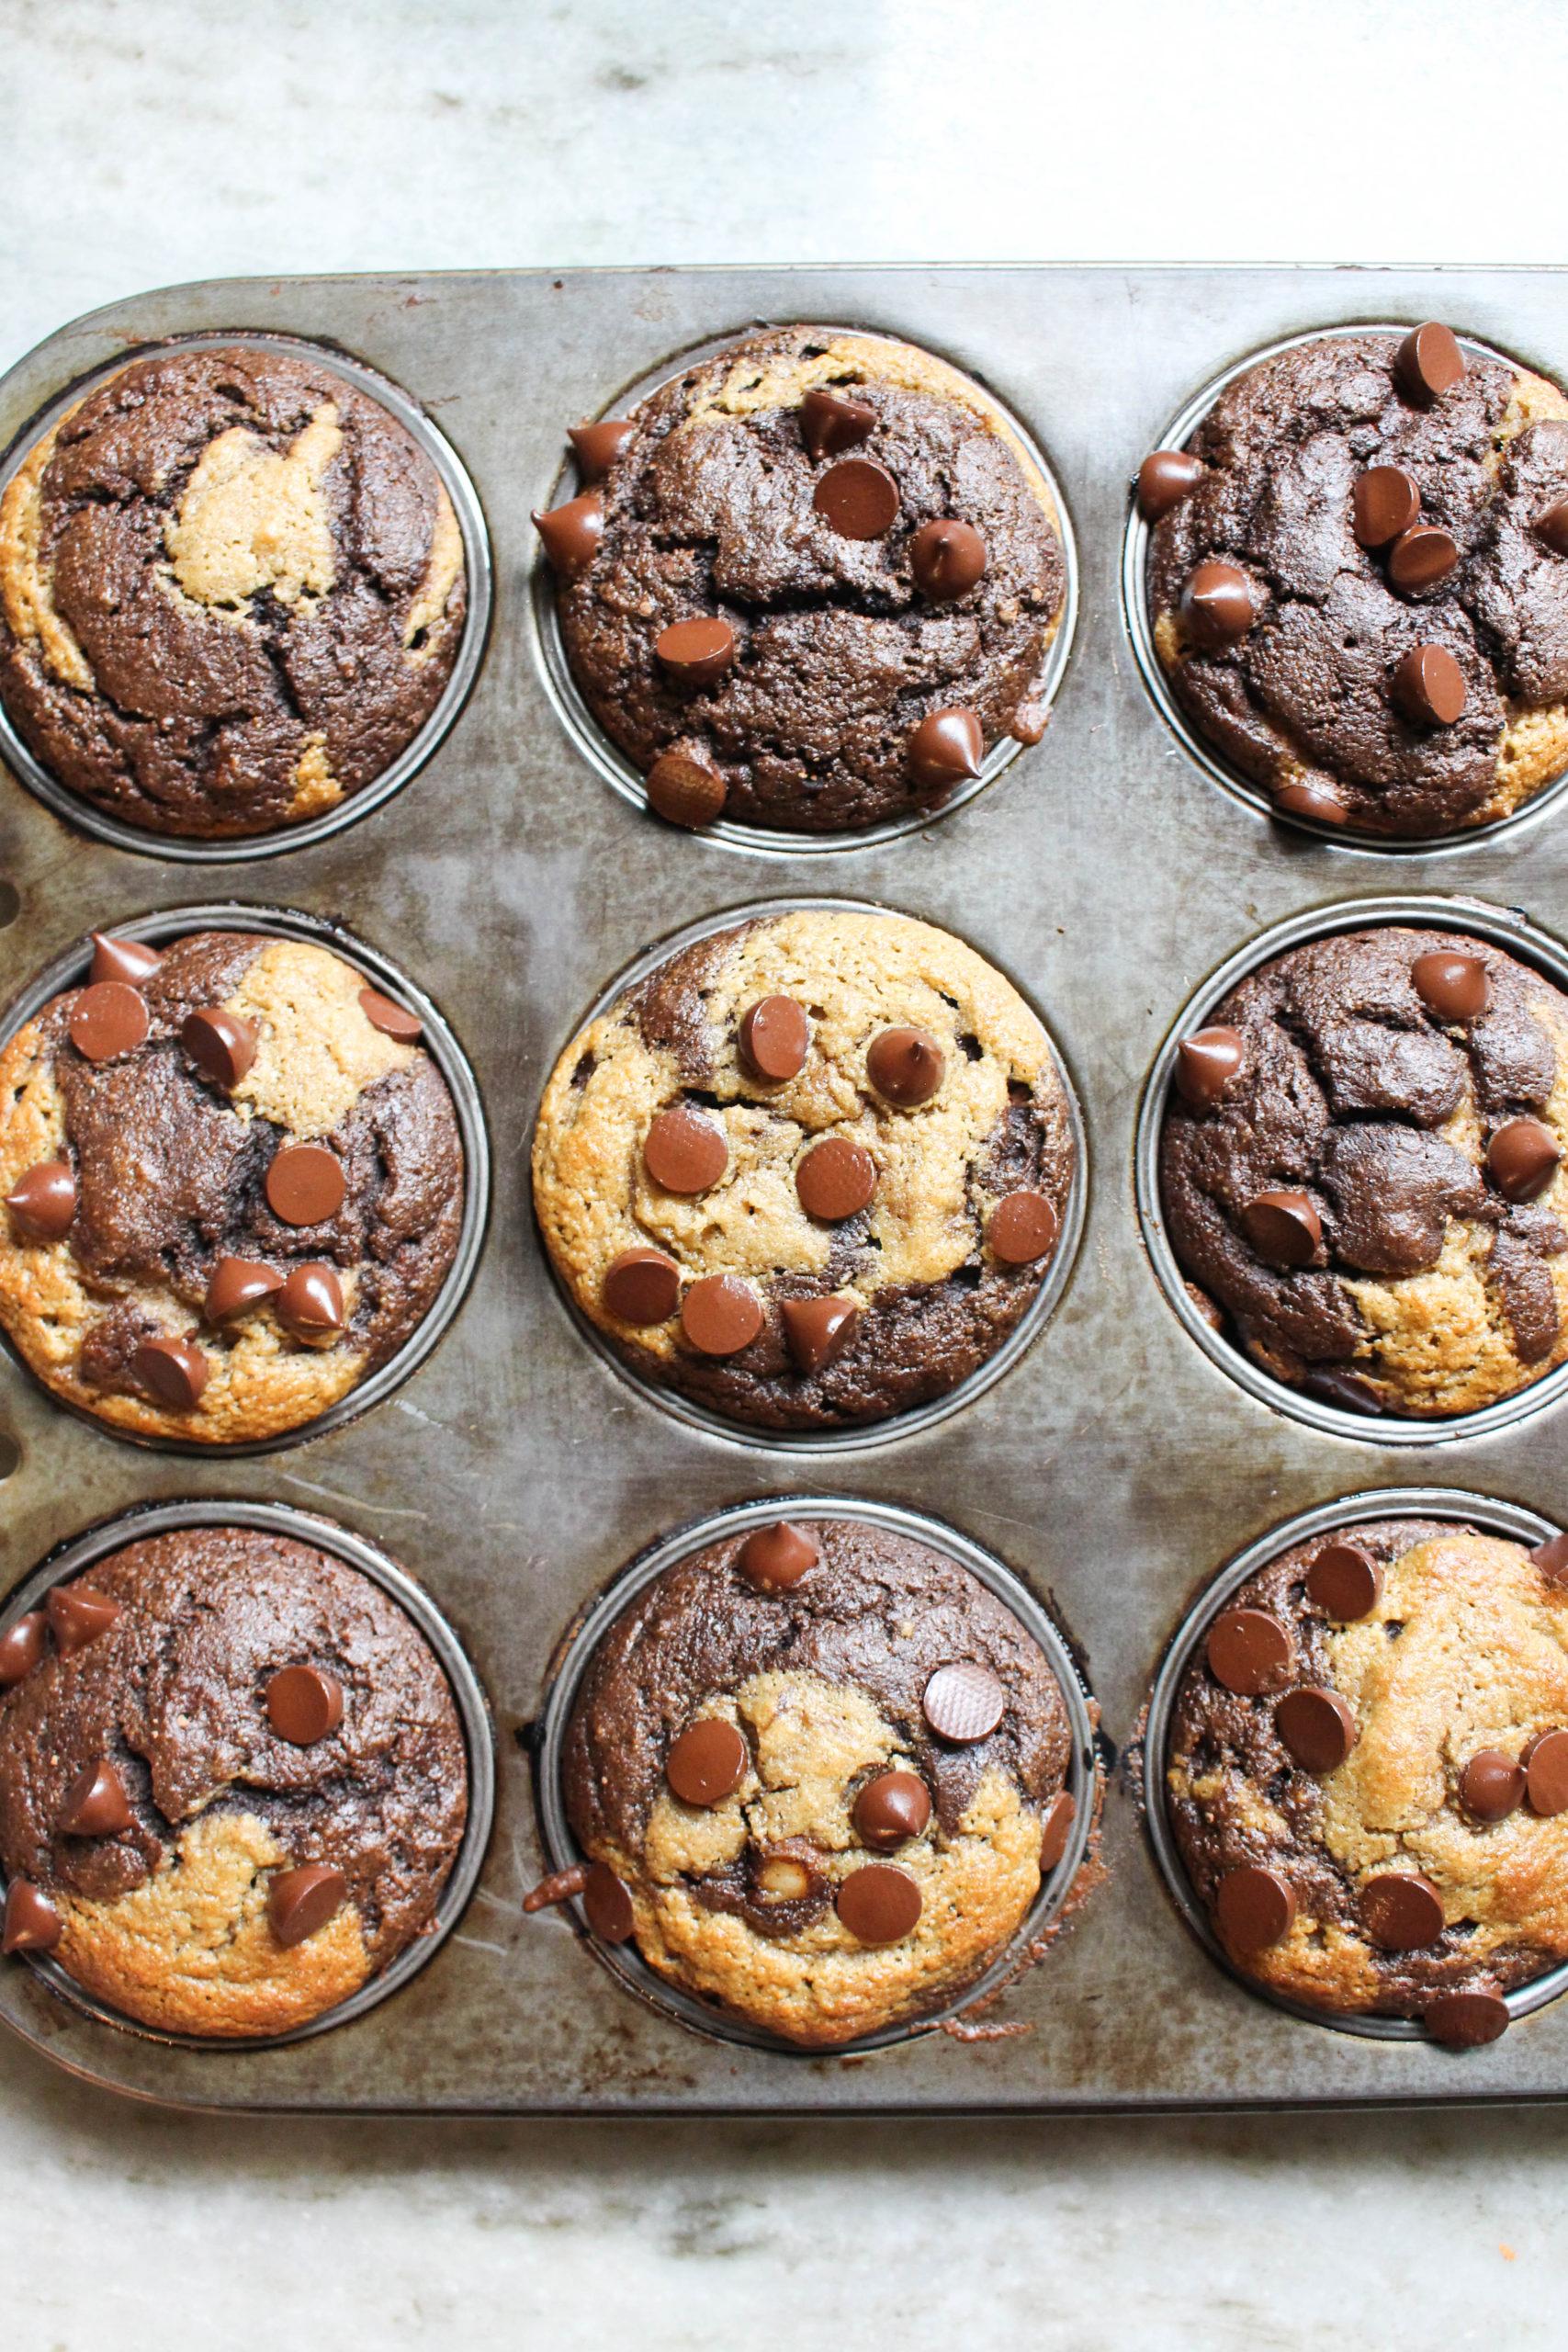 Chocolate twist banana bread muffins in muffin pan.